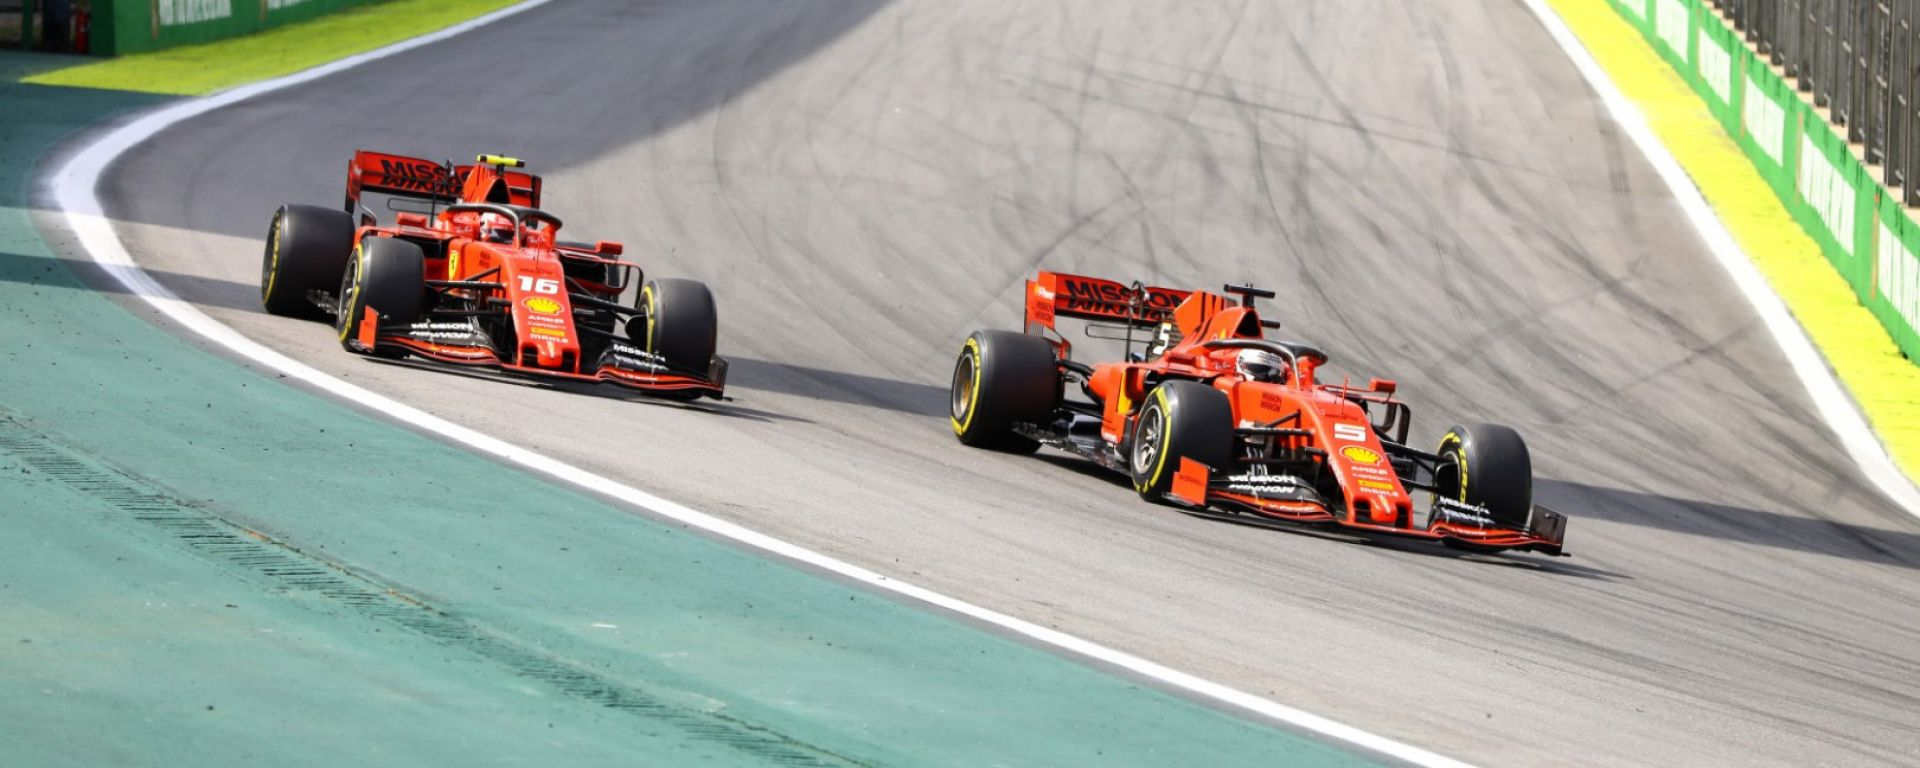 F1, GP Brasile 2019: Sebastian Vettel e Charles Leclerc (Ferrari)